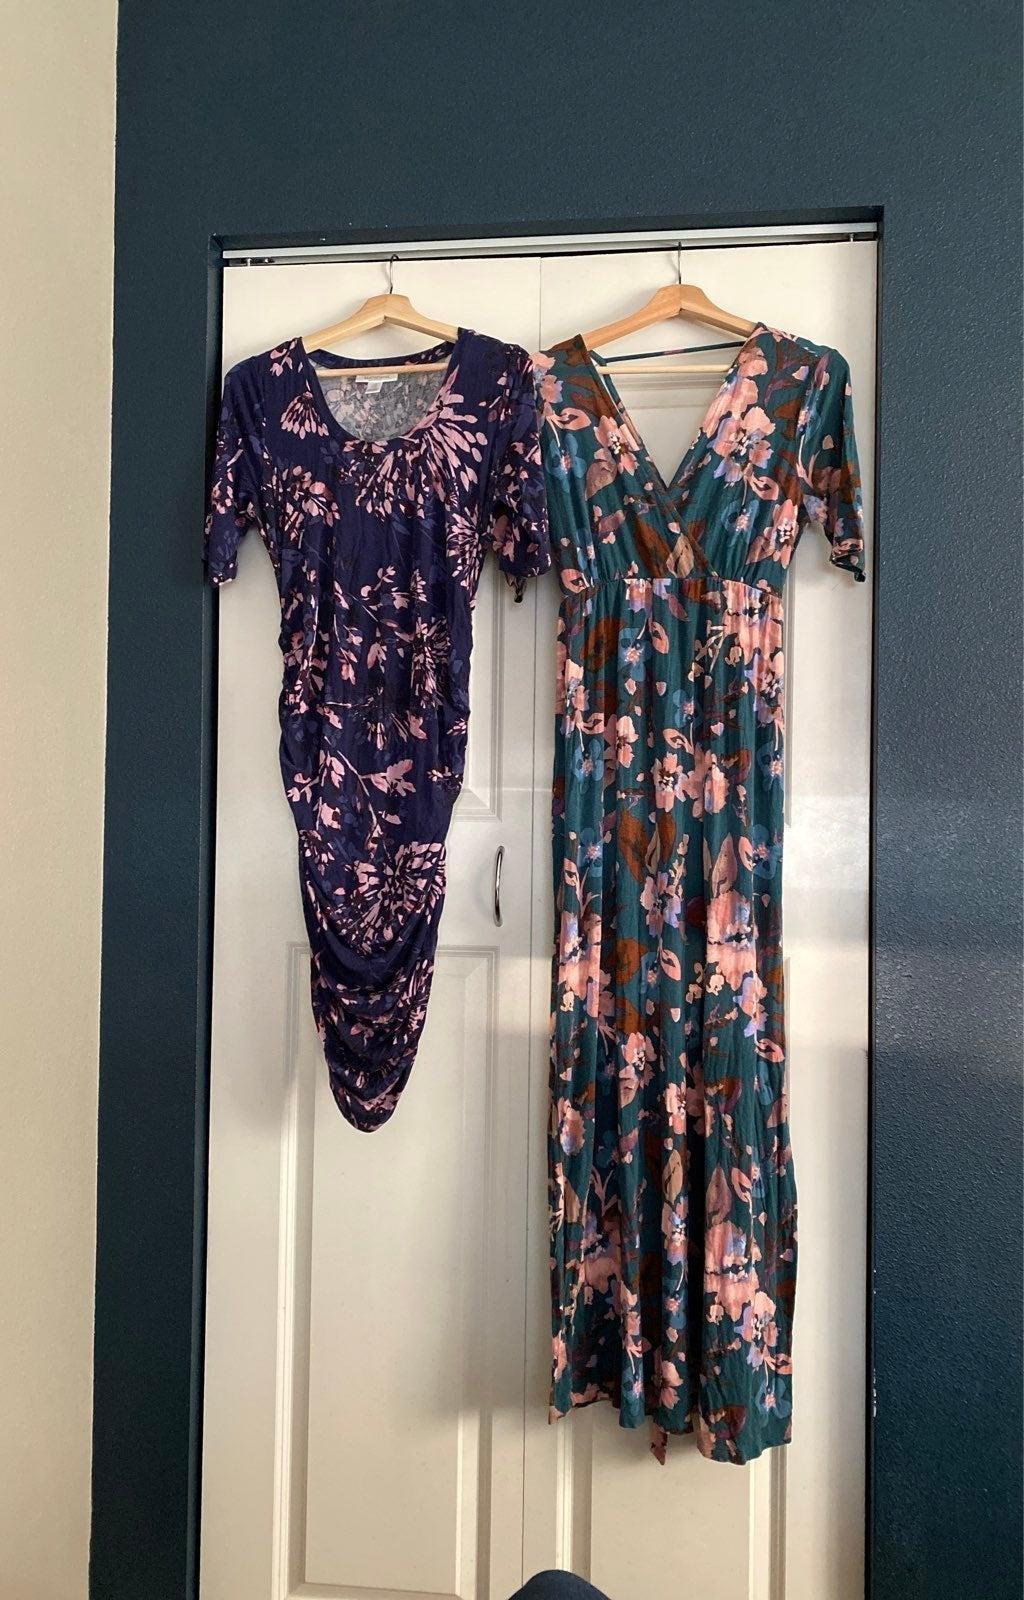 2 Maternity Dresses size medium